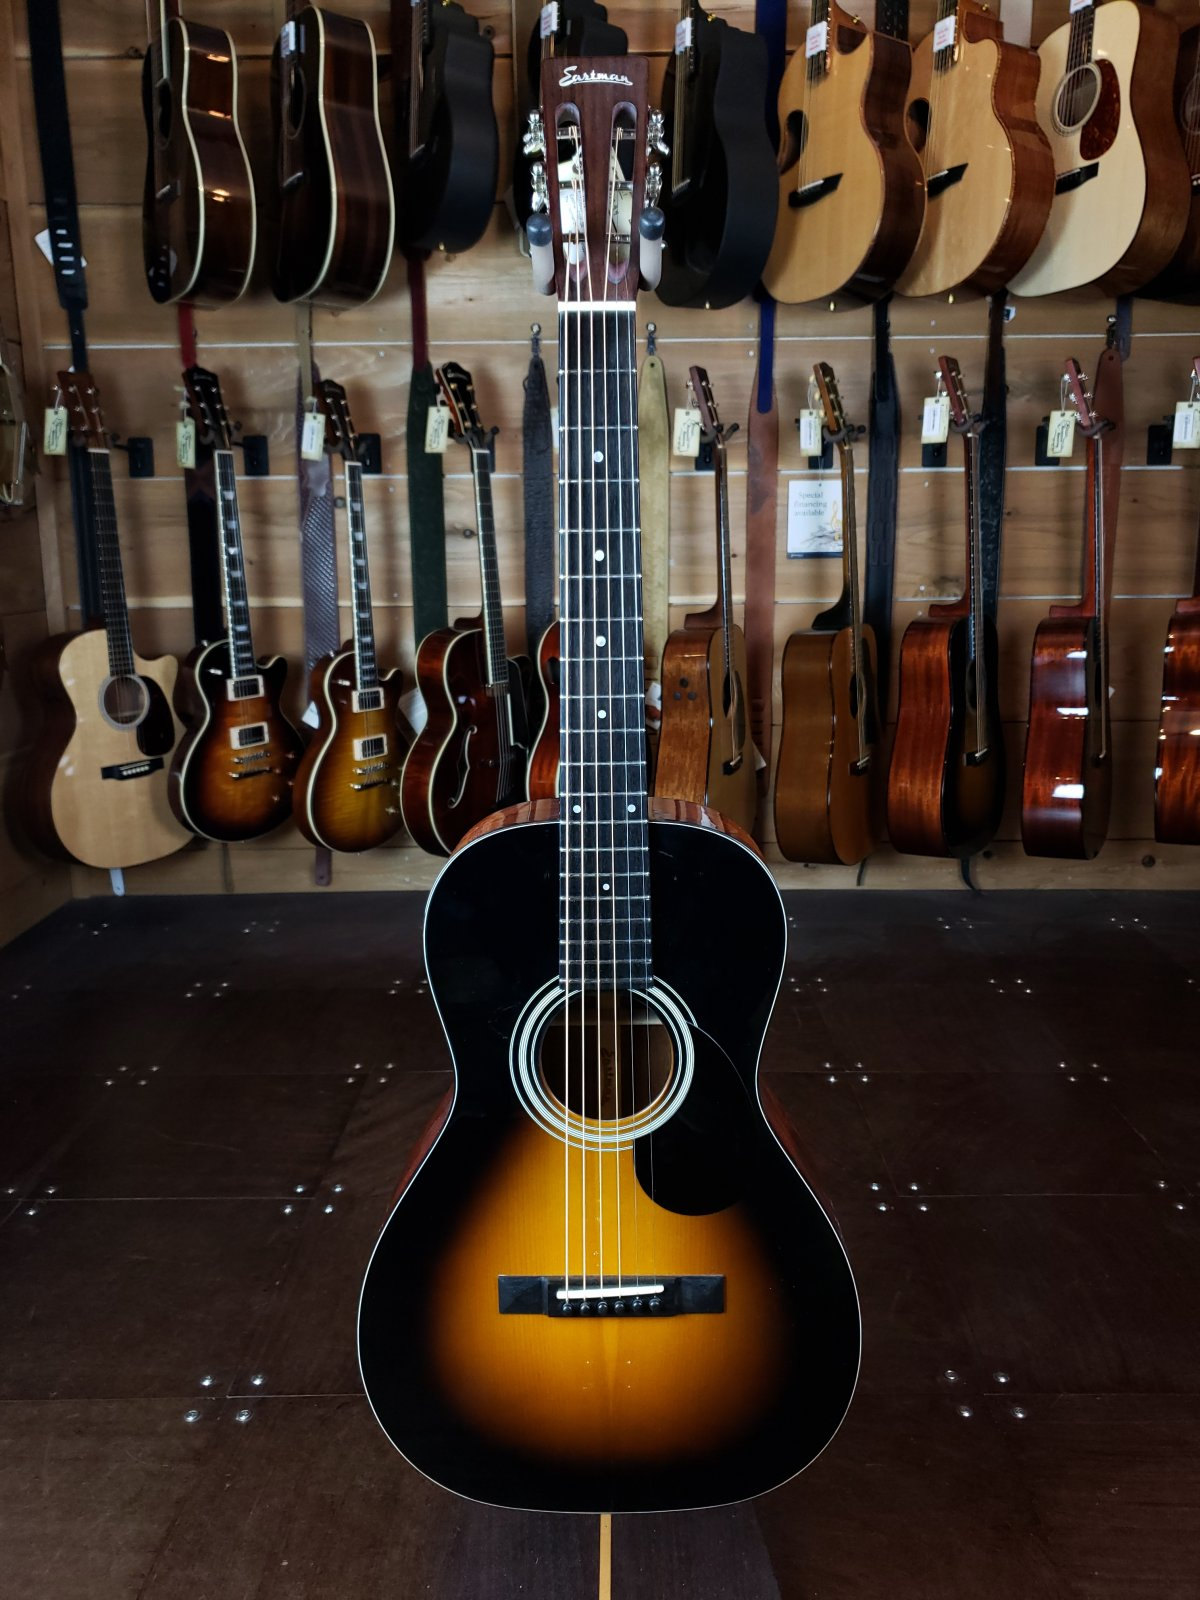 Eastman E10P-SB Adirondack Top Sunburst Parlor Guitar #5633